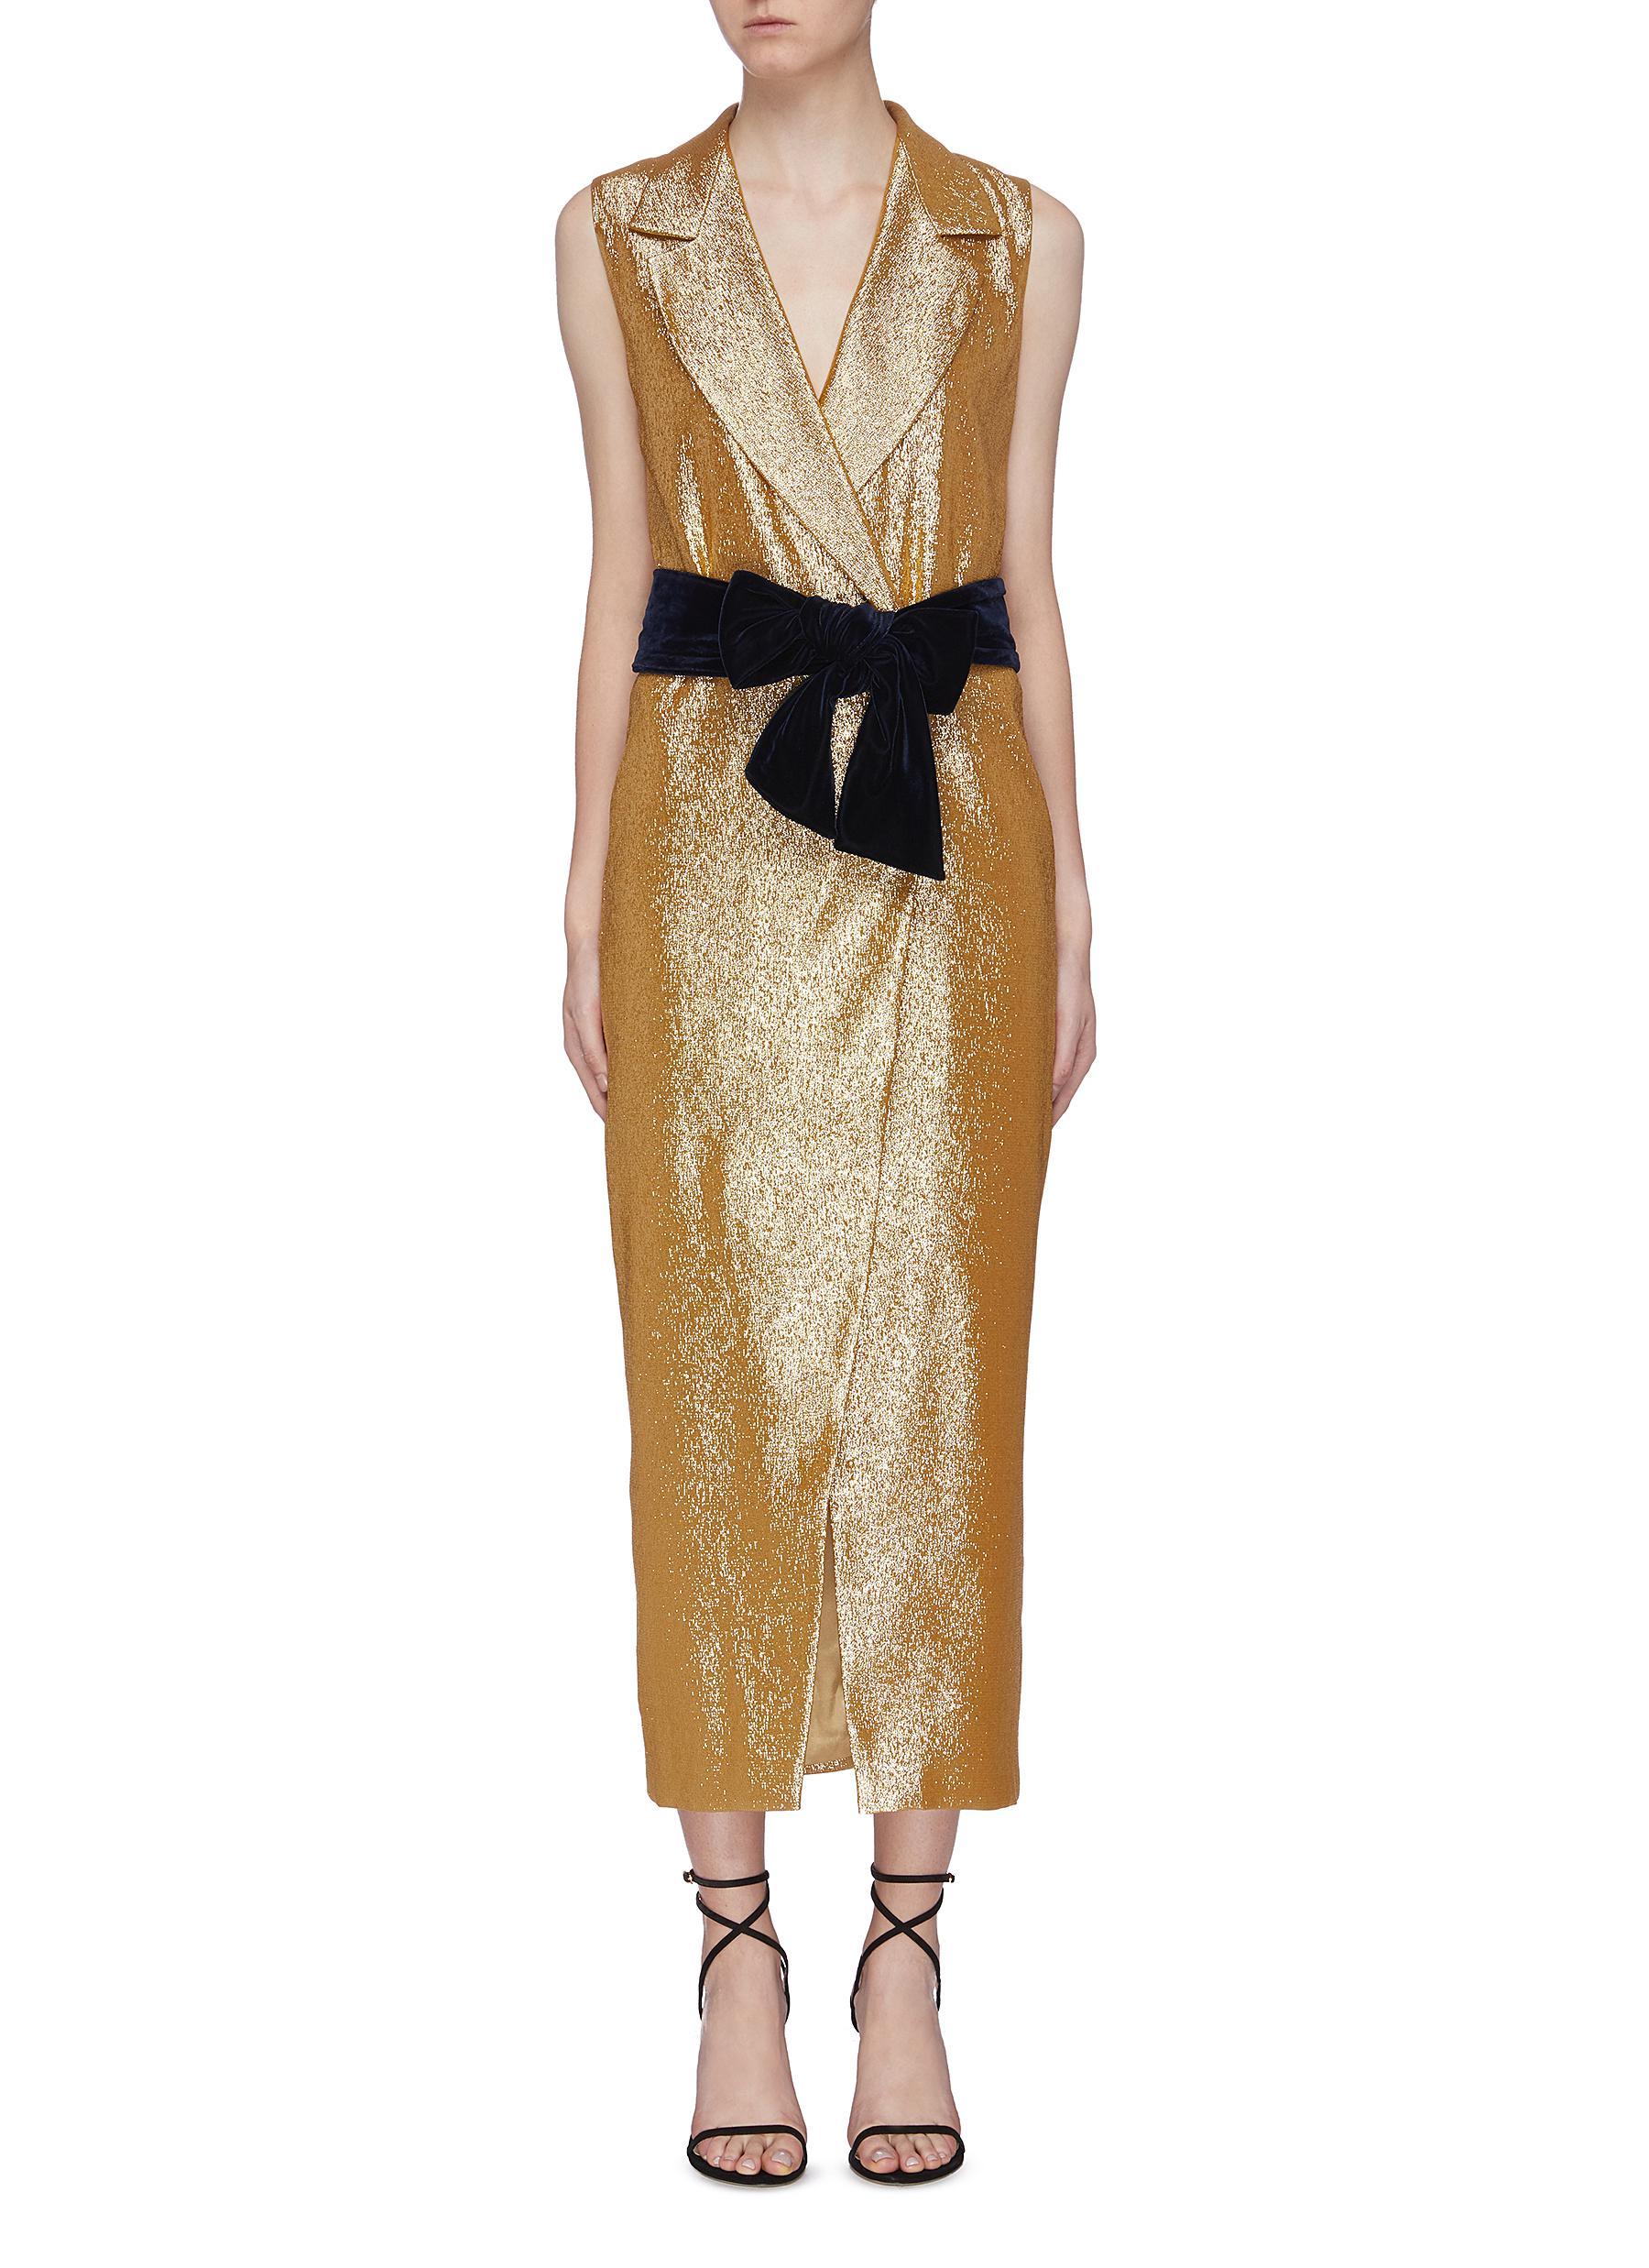 Gaia belted metallic vest dress by Leal Daccarett